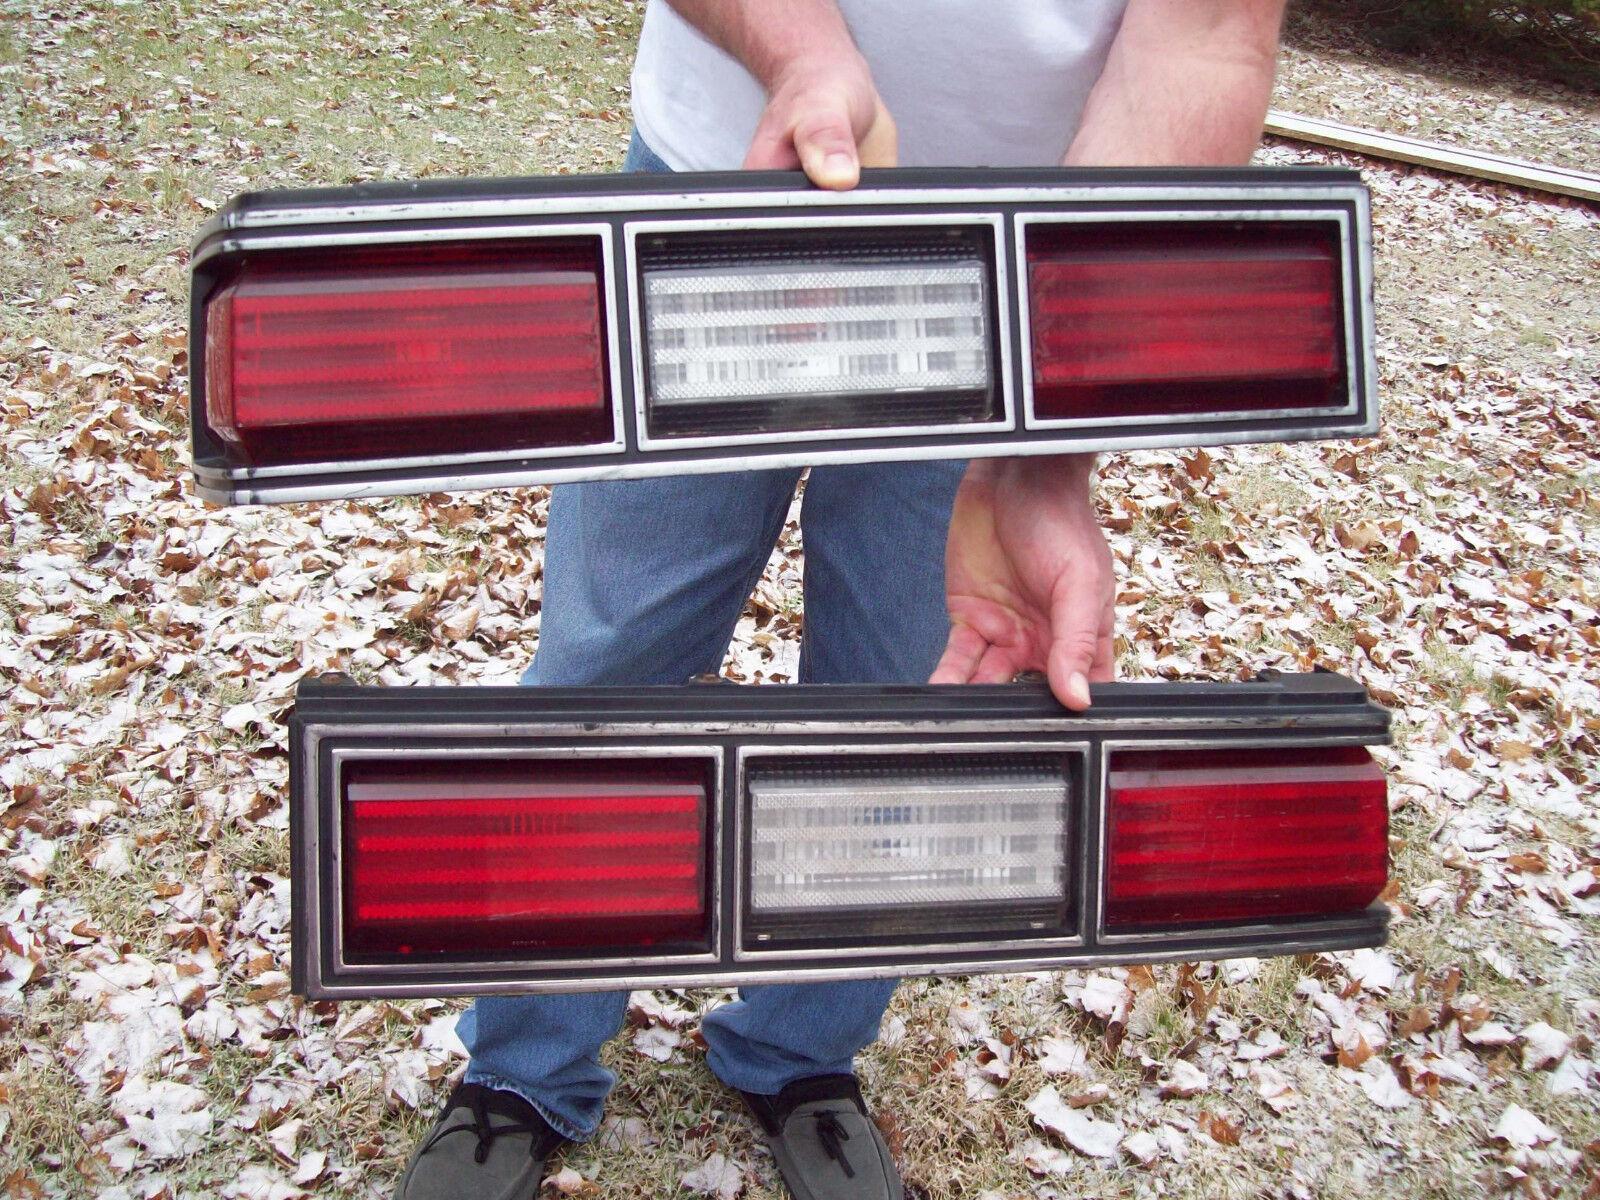 original equipment 1978-1983 chevrolet malibu stop tail lights pair w/housings